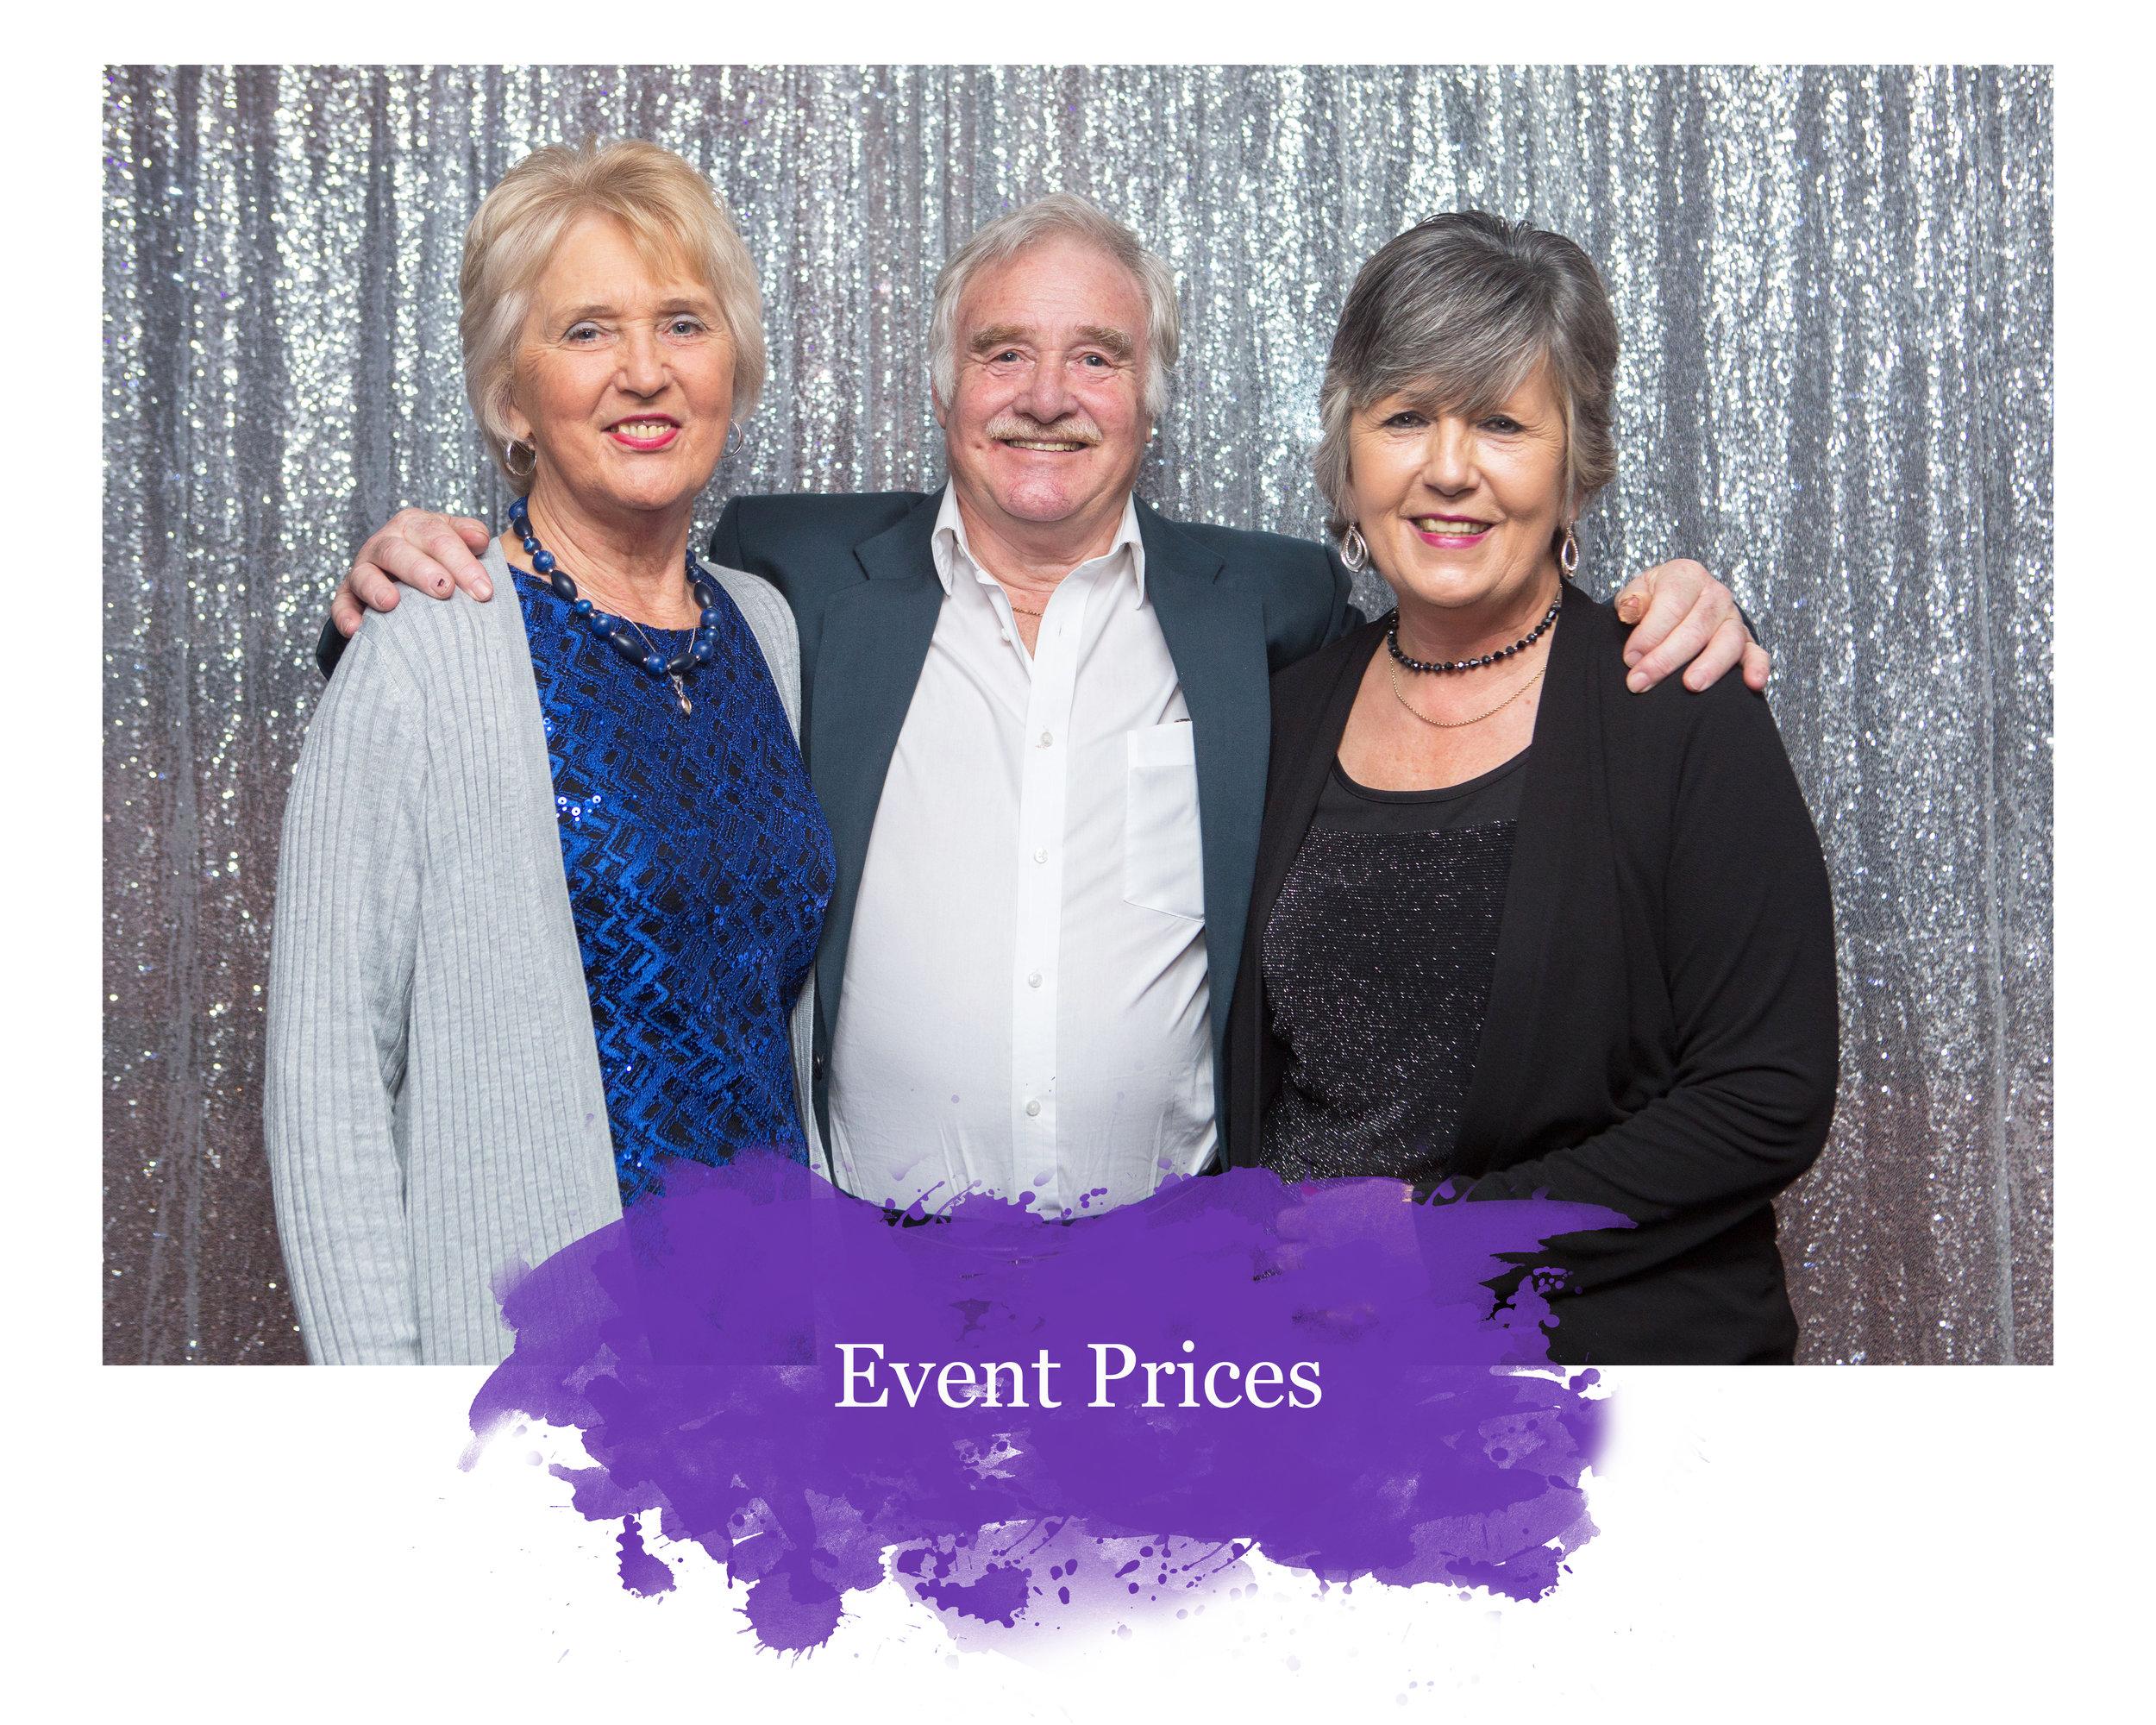 event prices.jpg